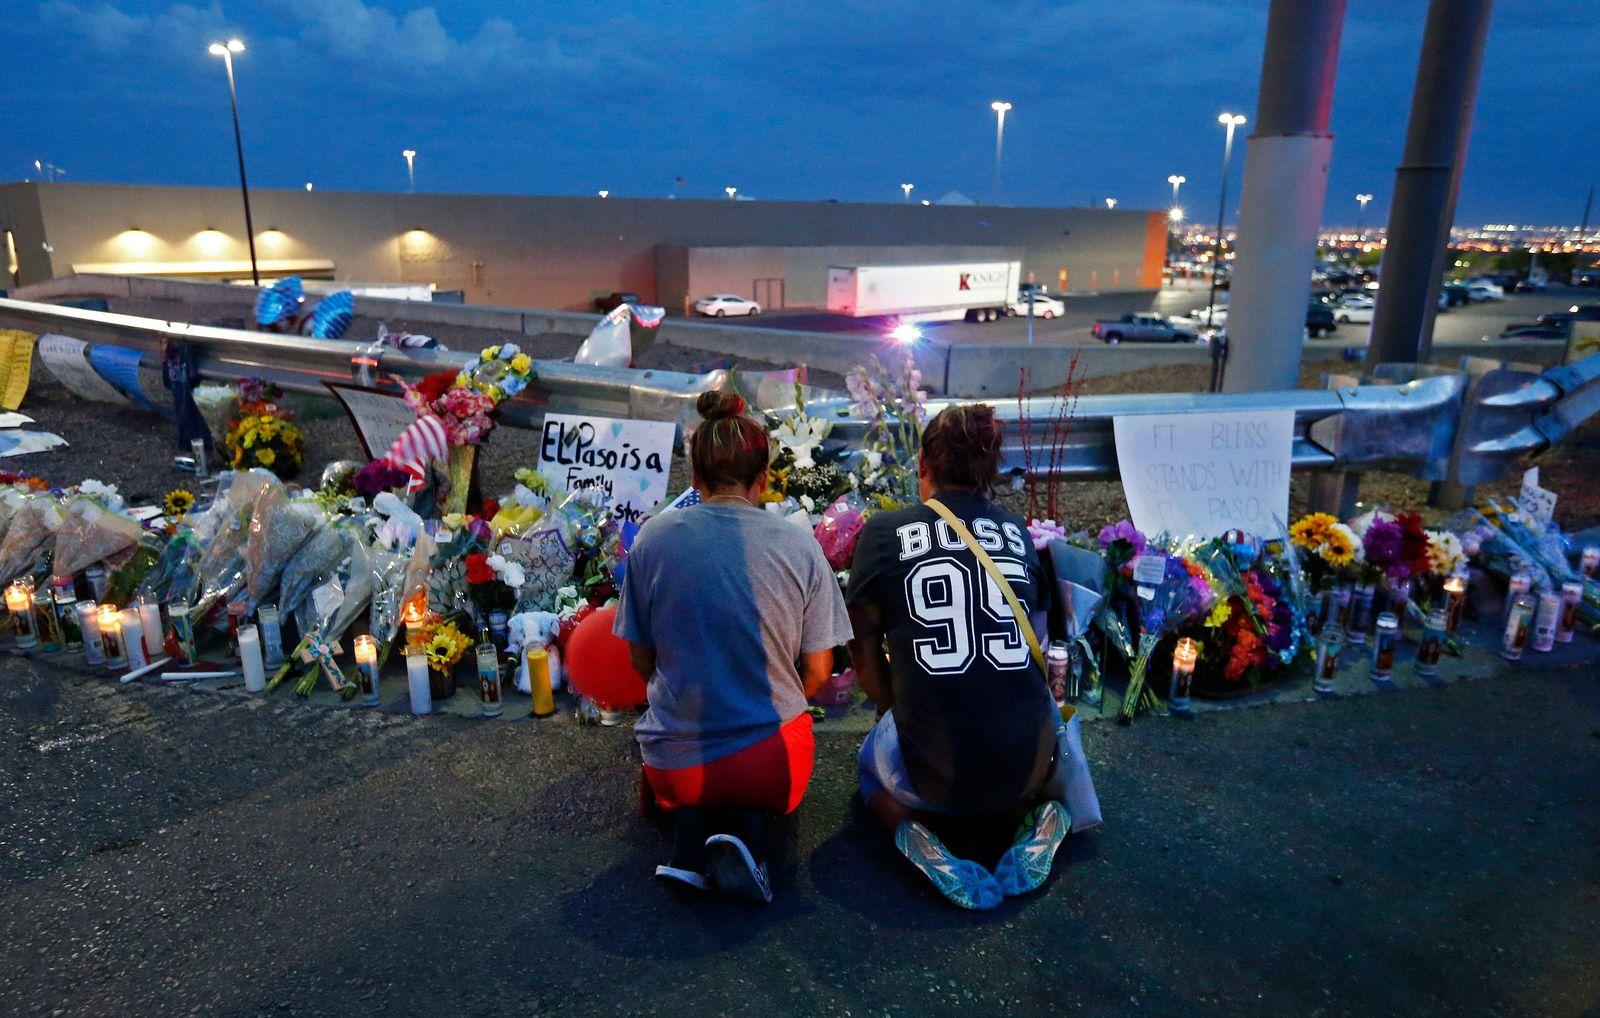 El Paso Shooting/ Massaker/ Amoklauf/ 2019